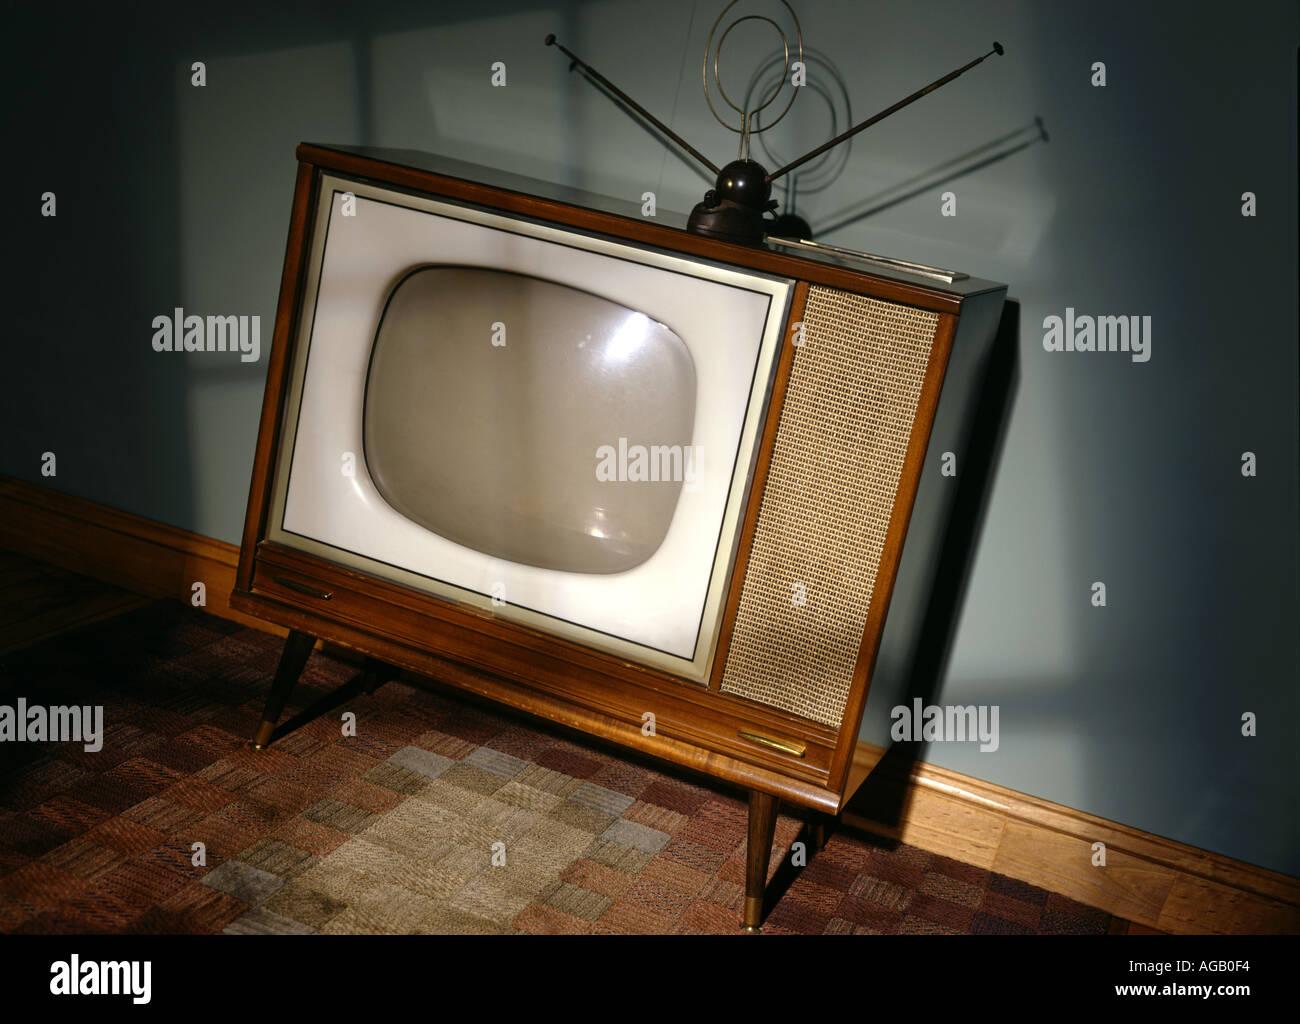 Vintage TV Television set old horizontal - Stock Image